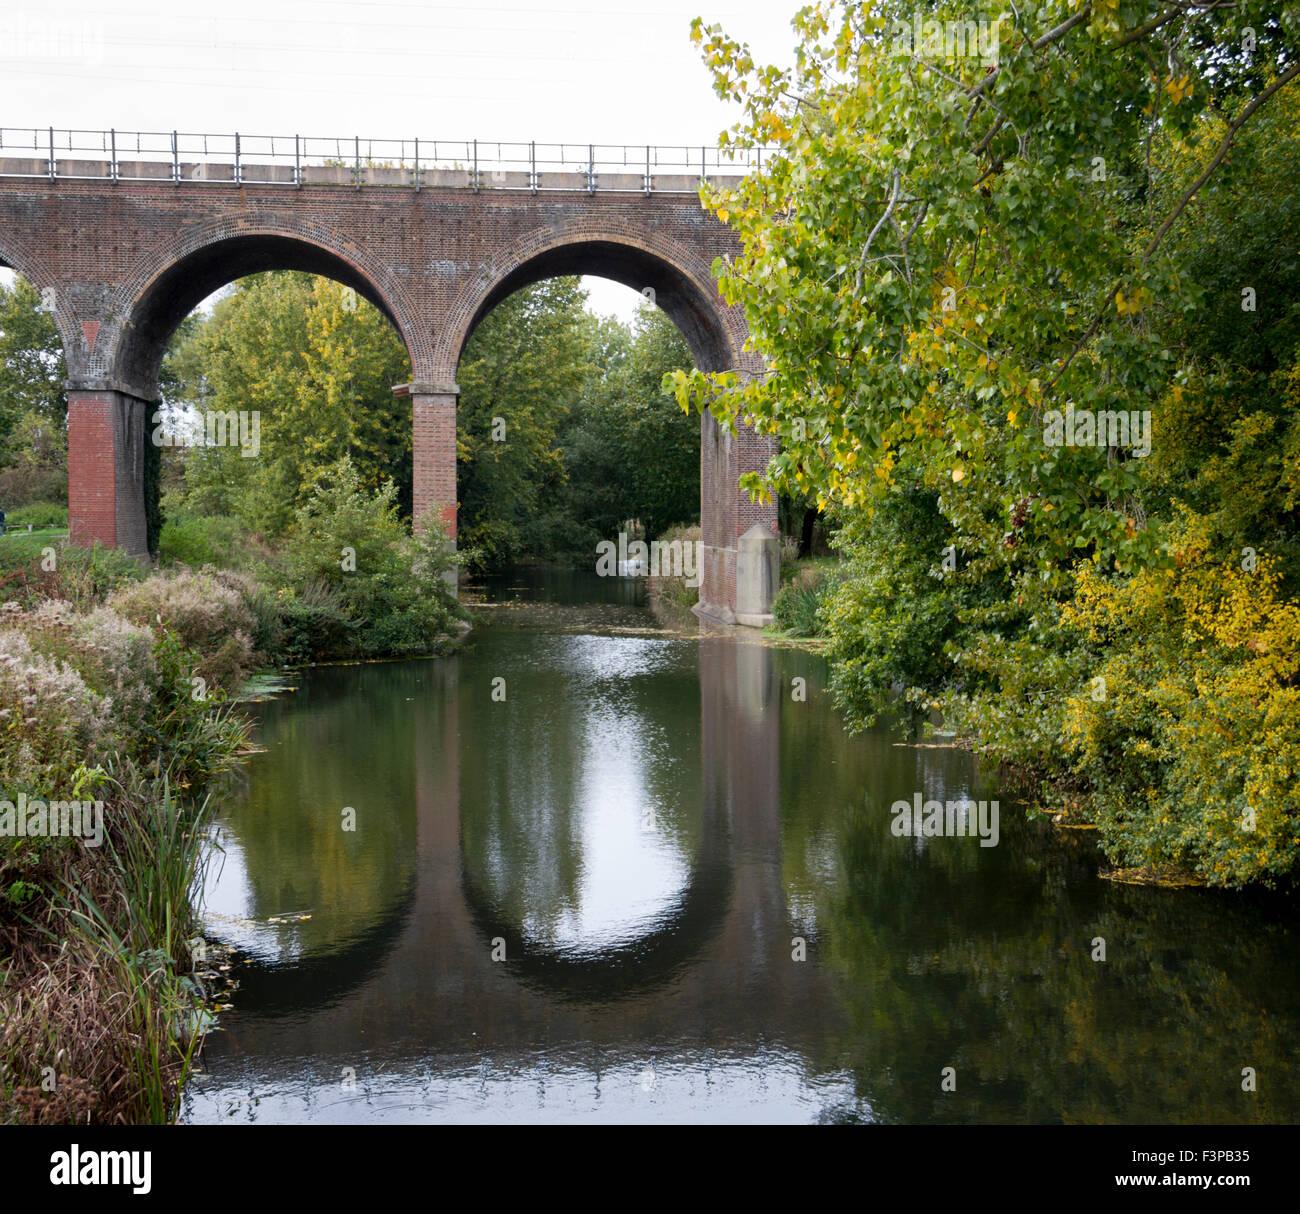 railway bridge over river cann , central park, chelmsford essex uk - Stock Image